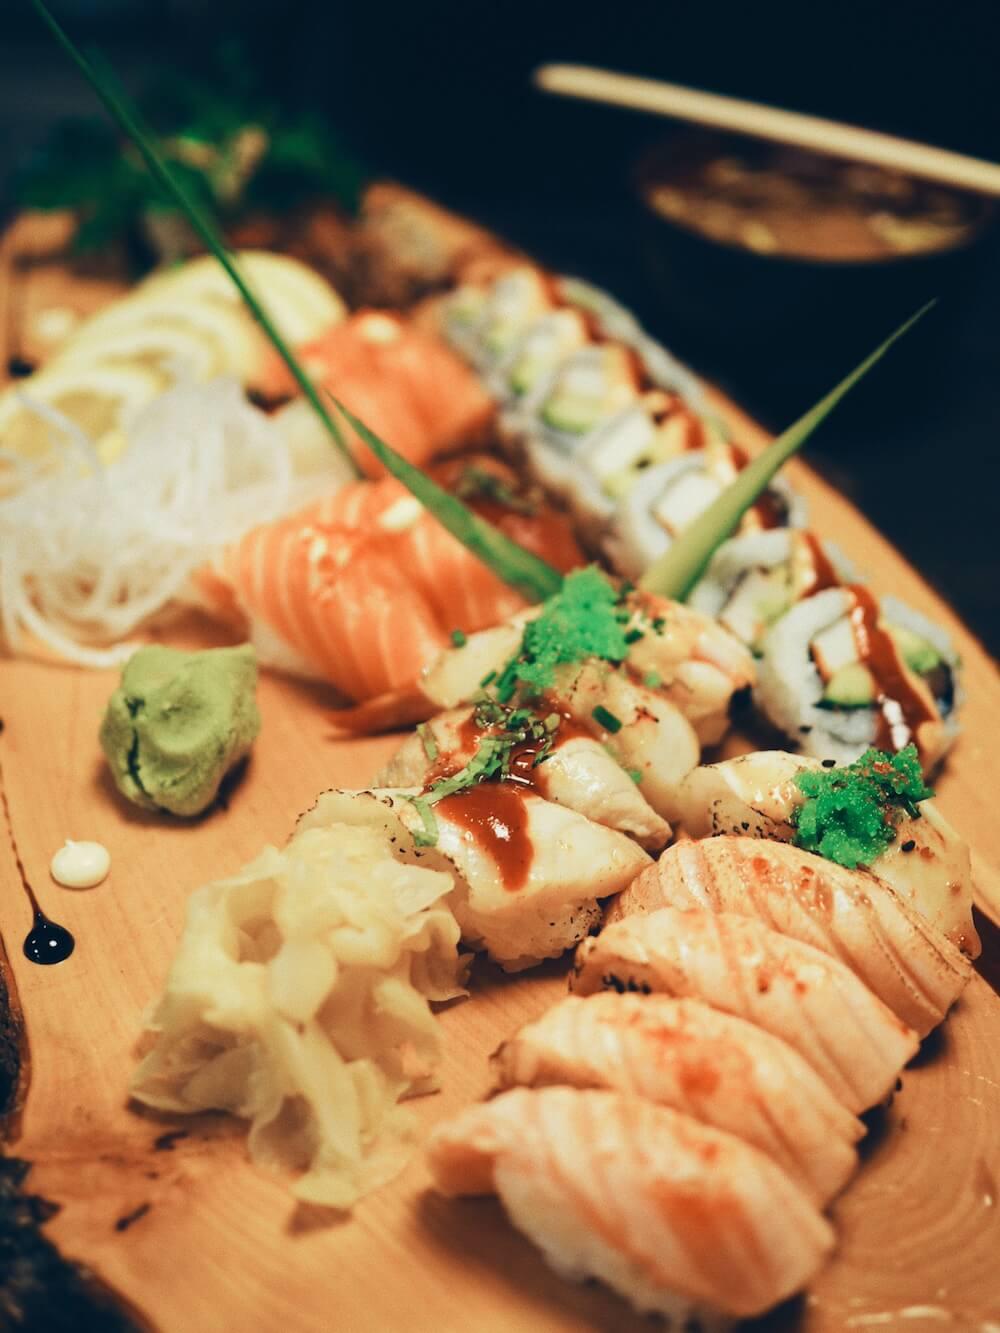 Yukari Daido_Zugoi Sushi Stockholm_2017-05-24